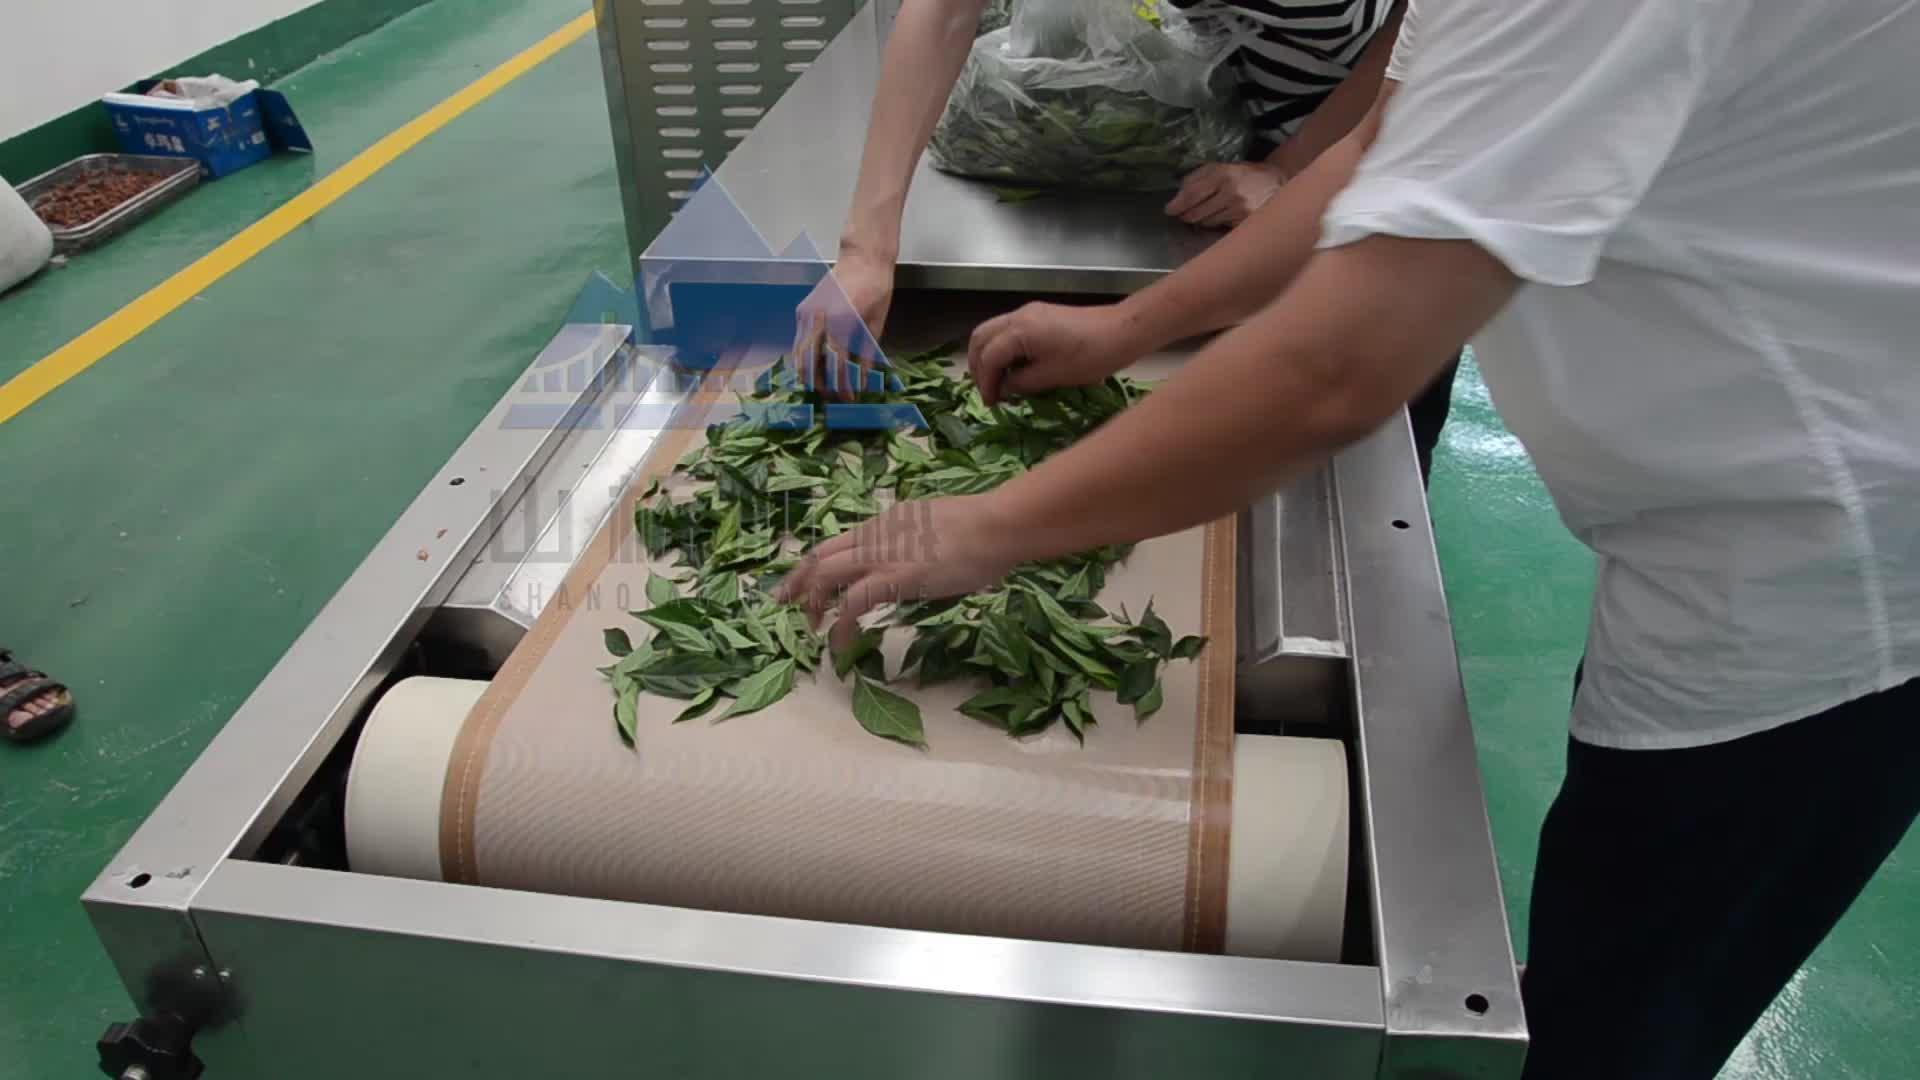 Endüstriyel konveyör bant tipi mikrodalga ot yaprak kurutma makinesi/mikrodalga çay kurutma makinesi